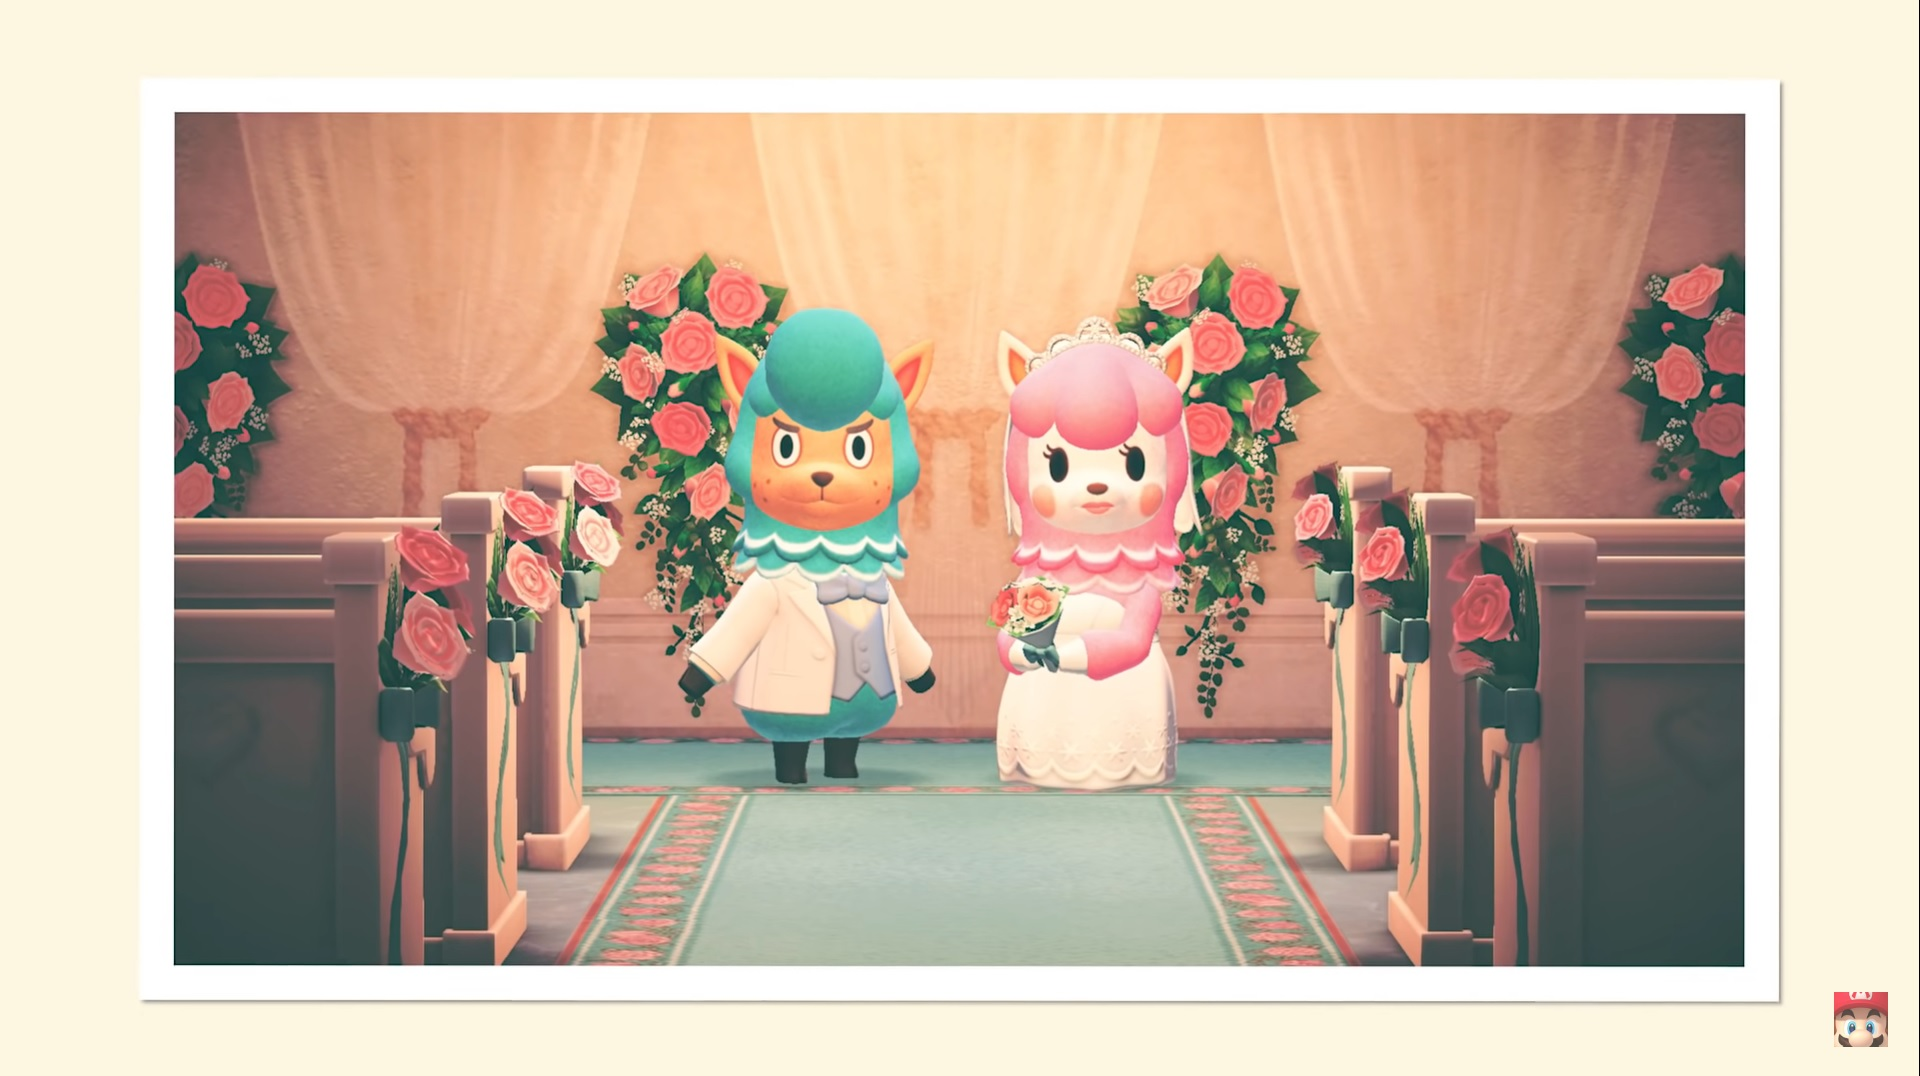 animal crossing, new horizons, wedding season